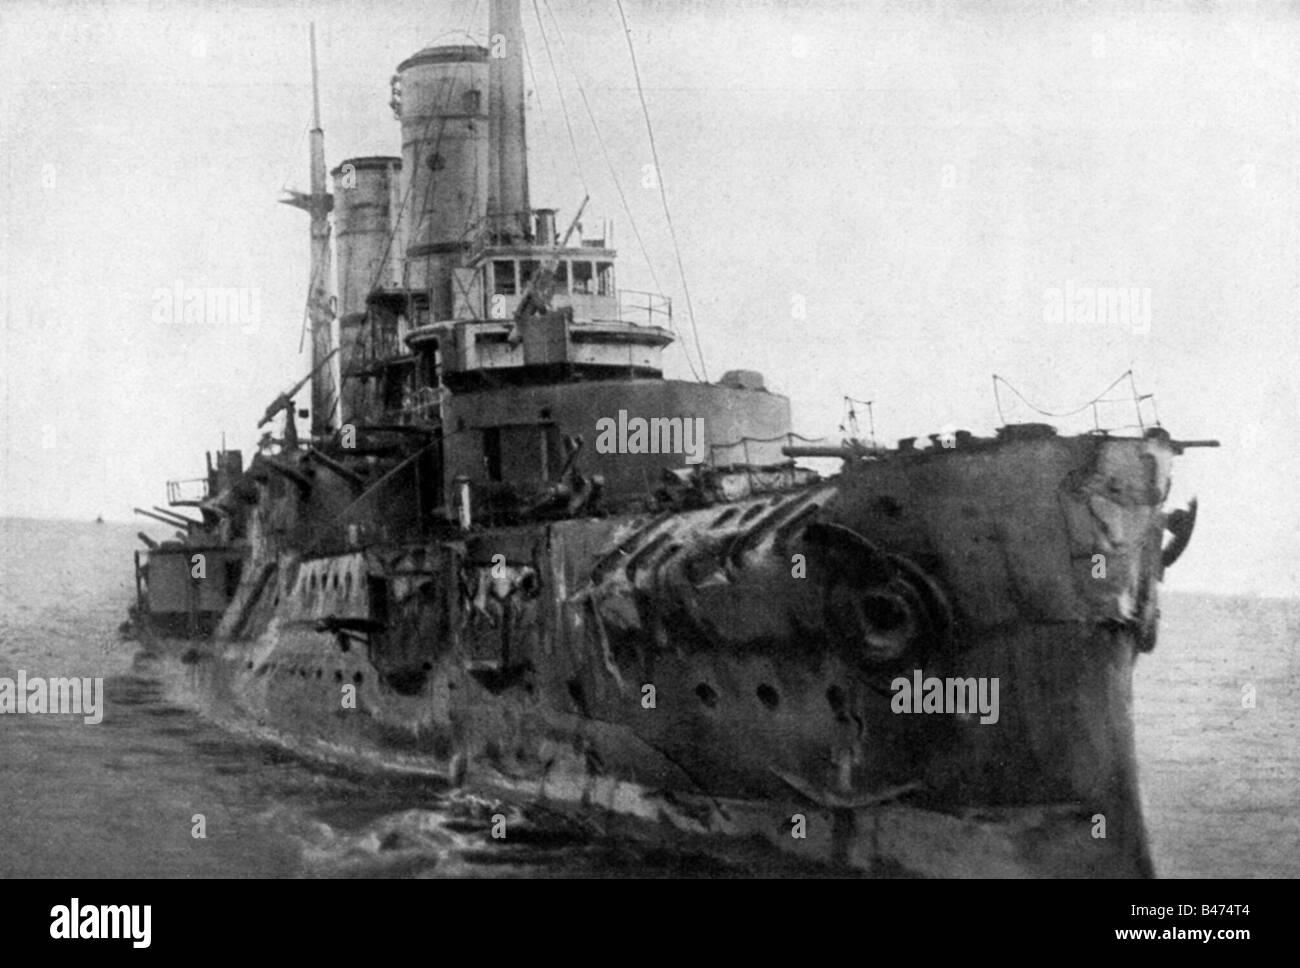 Events First World War Wwi Naval Warfare Battle Of Moon Sound Stock Photo